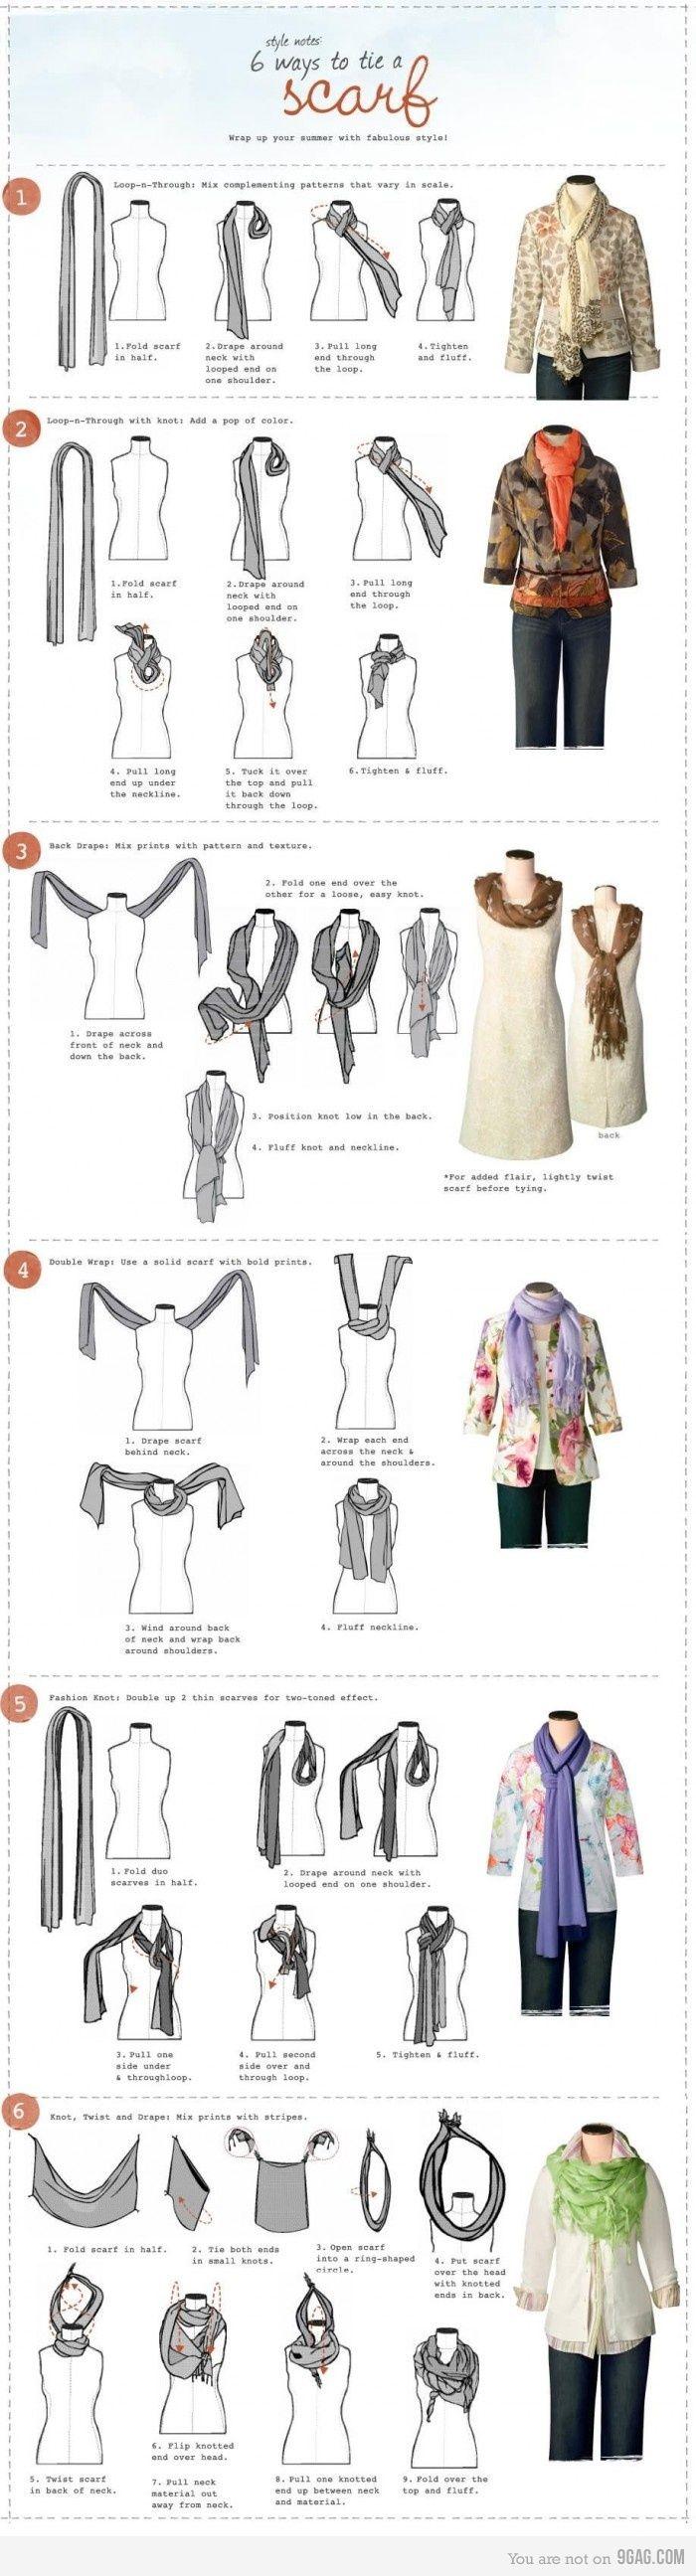 scarfstructions...